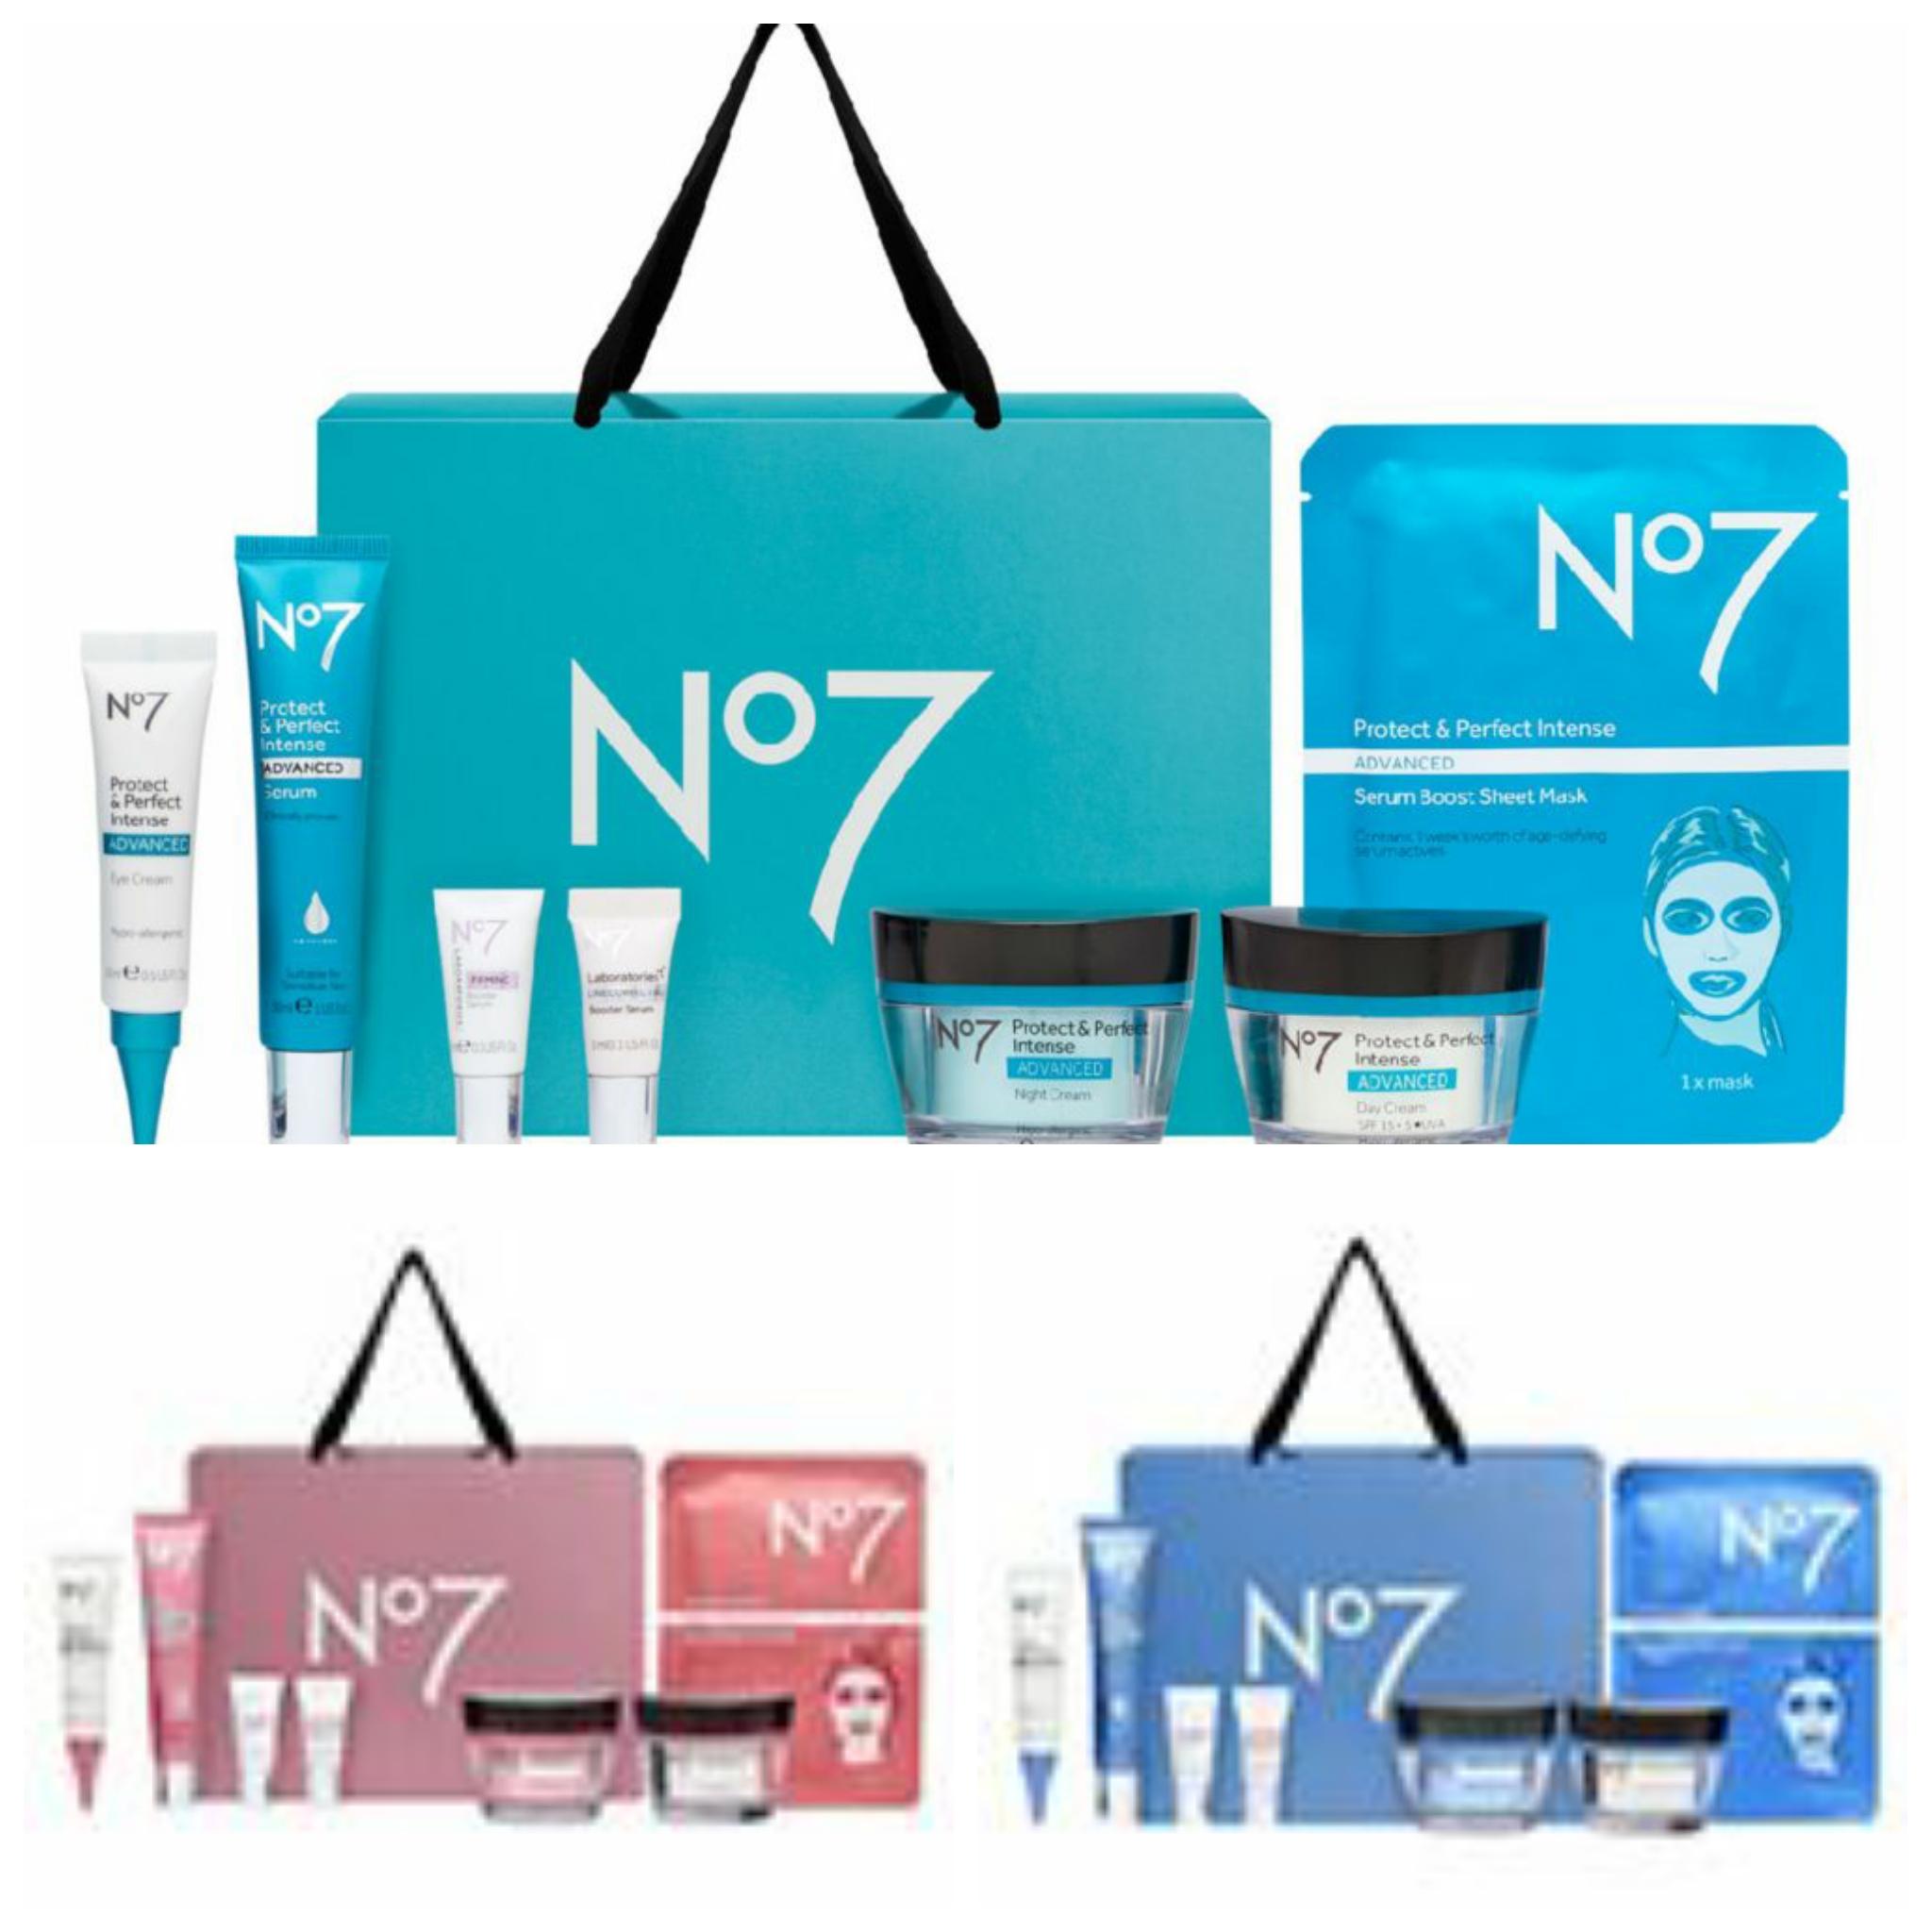 No7 Protect & Perfect Intense ADVANCED Collection/Restore & Renew/Lift & Laminate Gift Set + £10 No7 laboratories Voucher @ Boots